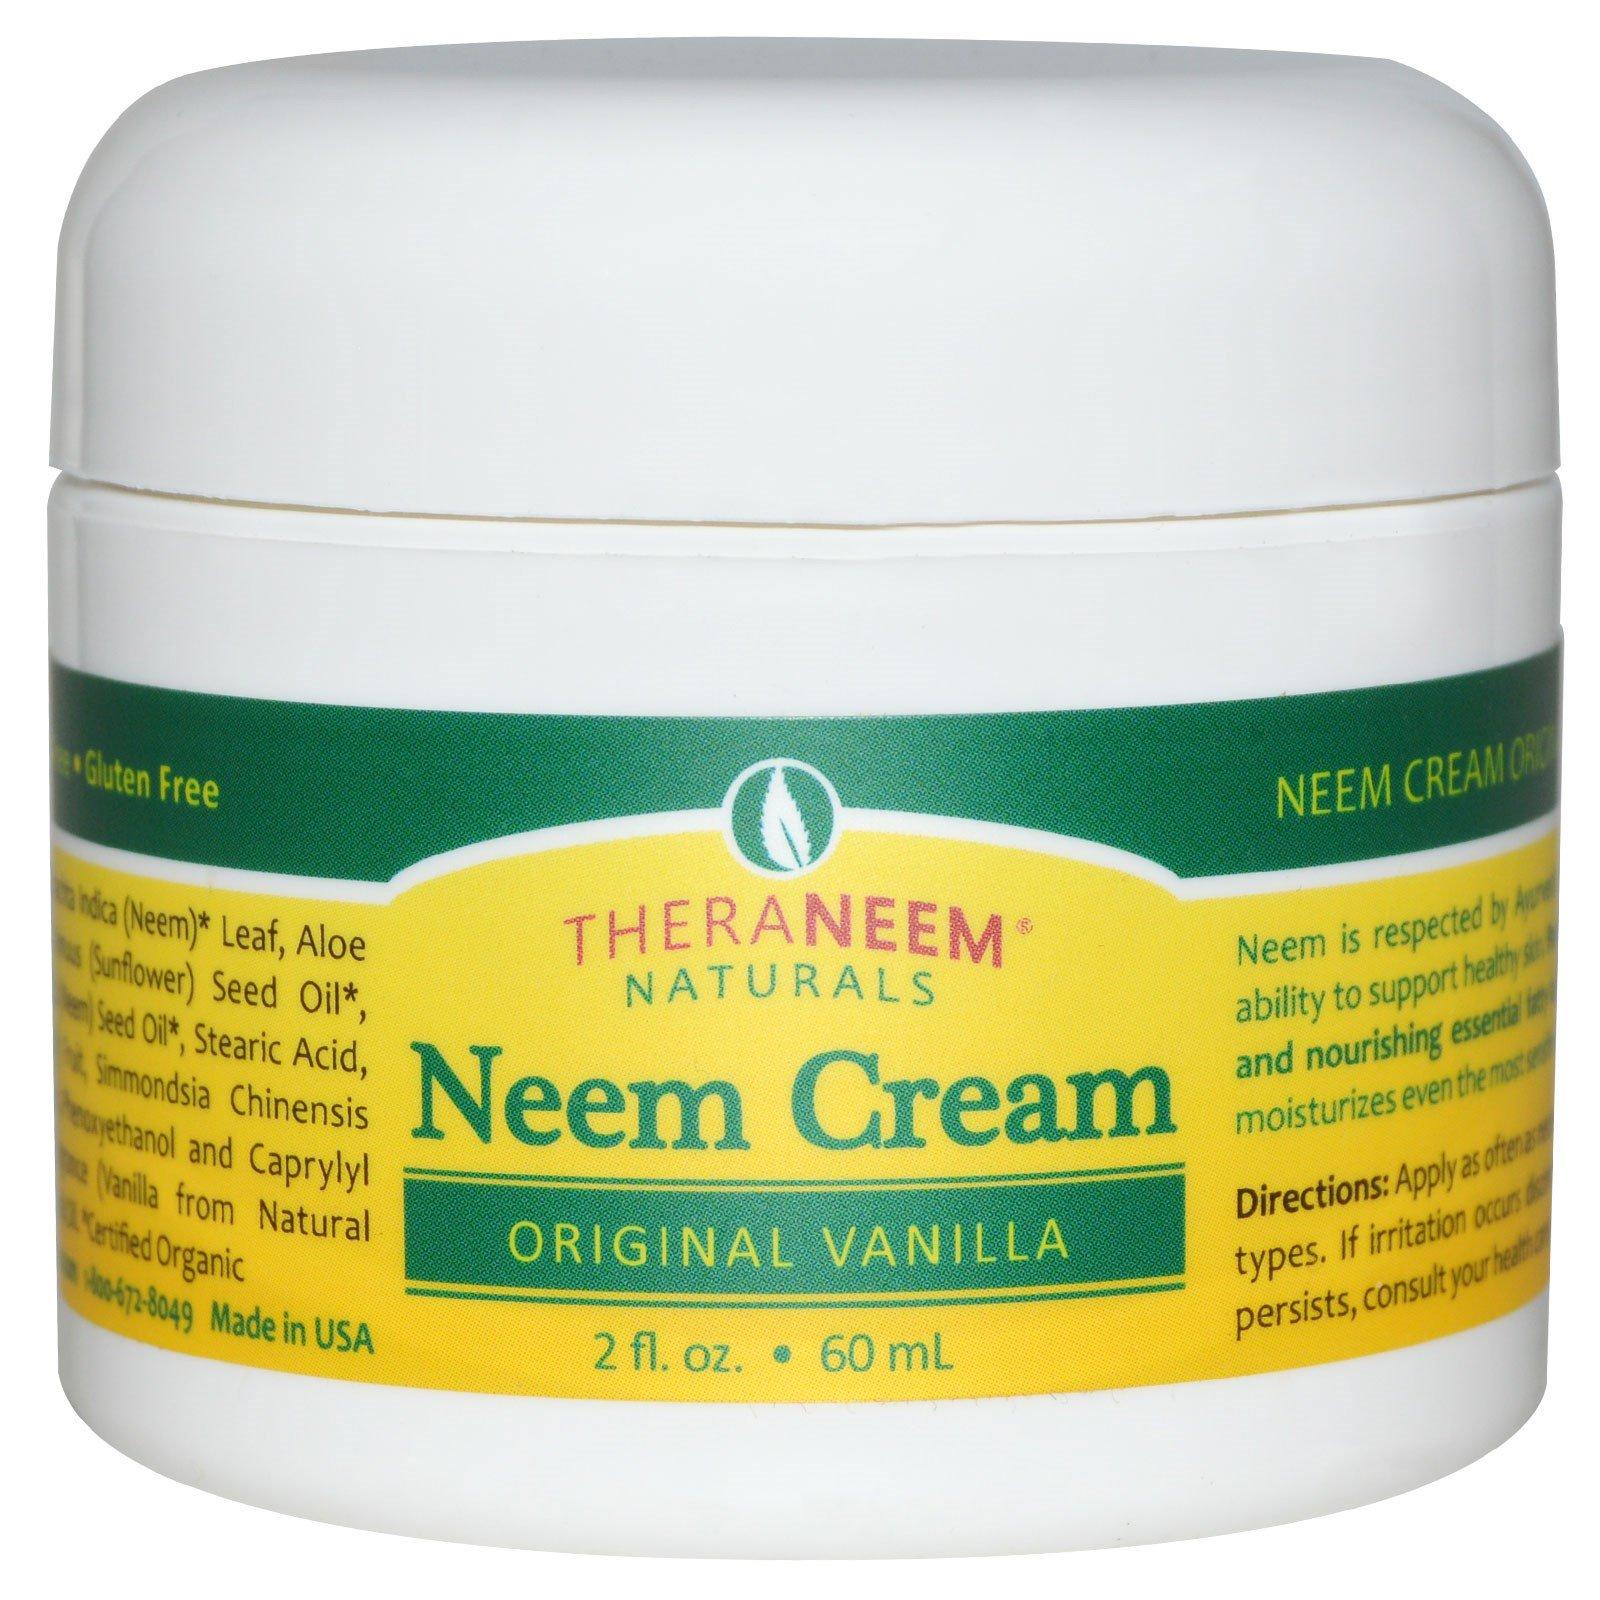 Organix South, Thera Neem Organix, Neem крем, оригинальная ваниль 2 унции (60 мл)